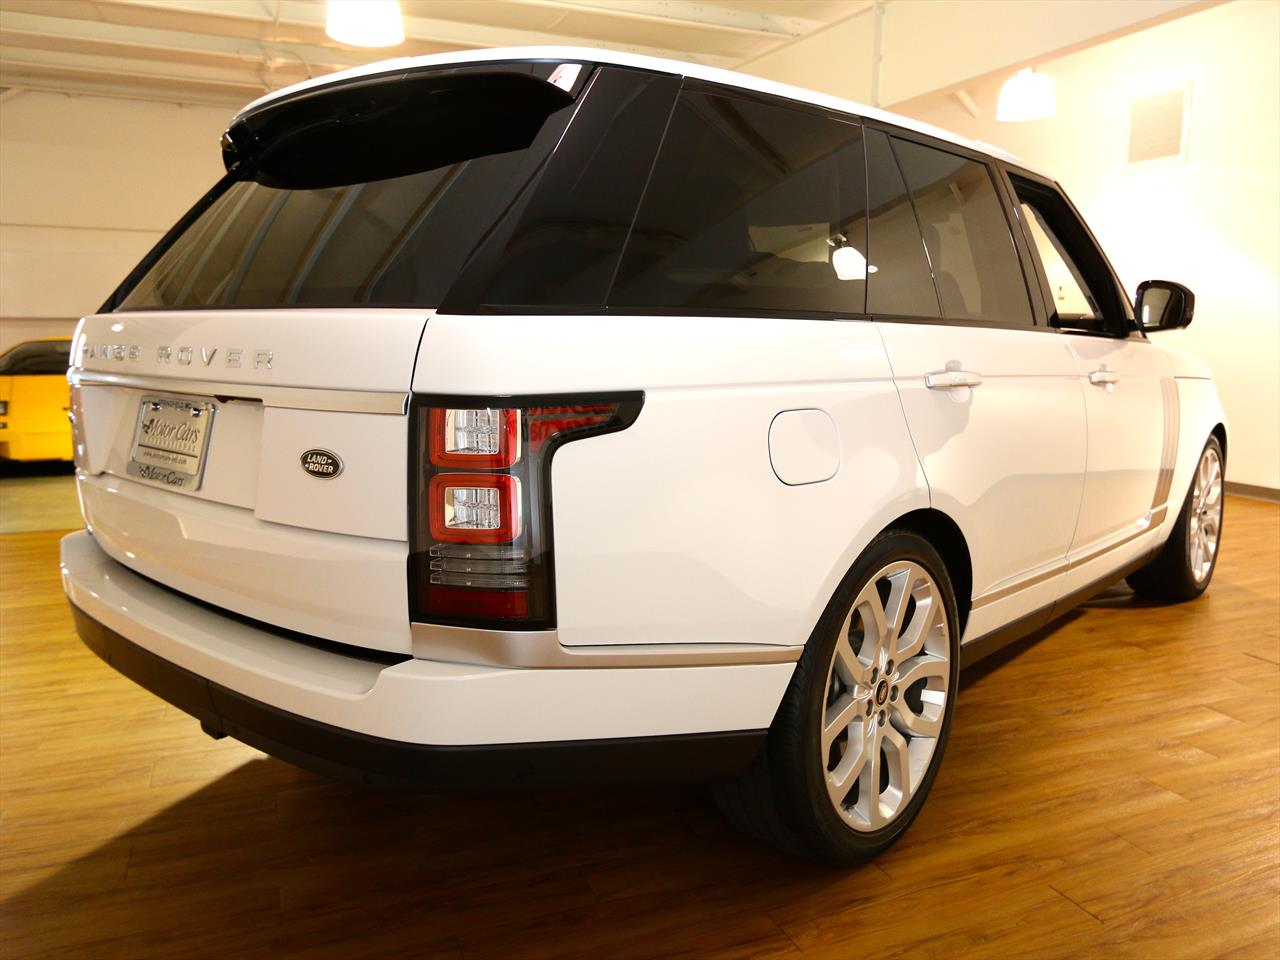 2014 land rover range rover supercharged autobiography. Black Bedroom Furniture Sets. Home Design Ideas